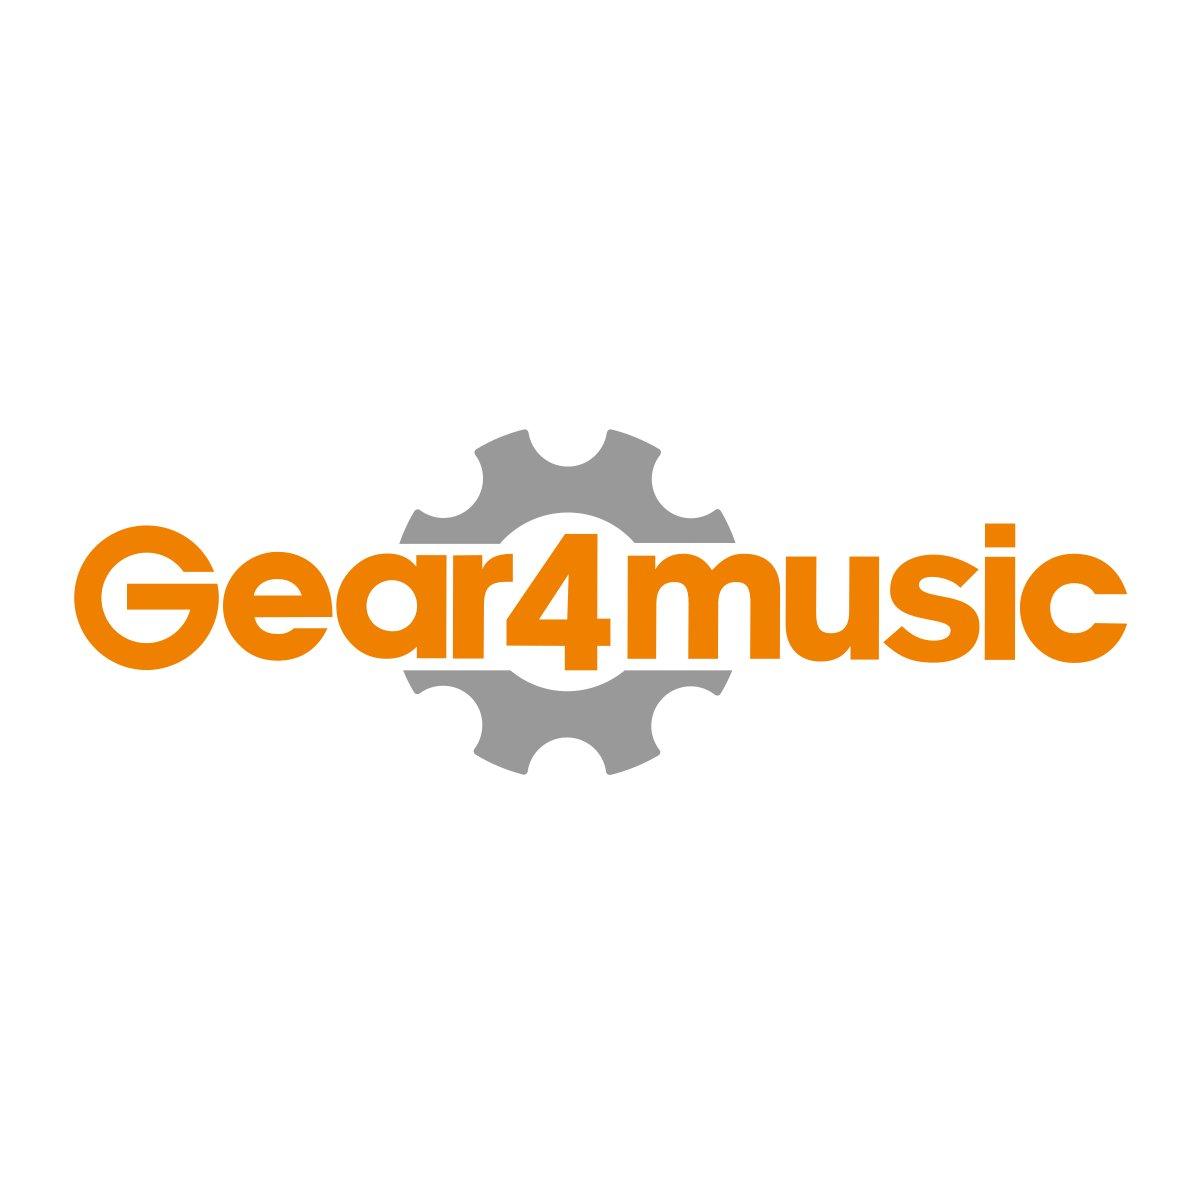 Pack de Ukelele de Concierto Electroacústico Deluxe de Gear4music